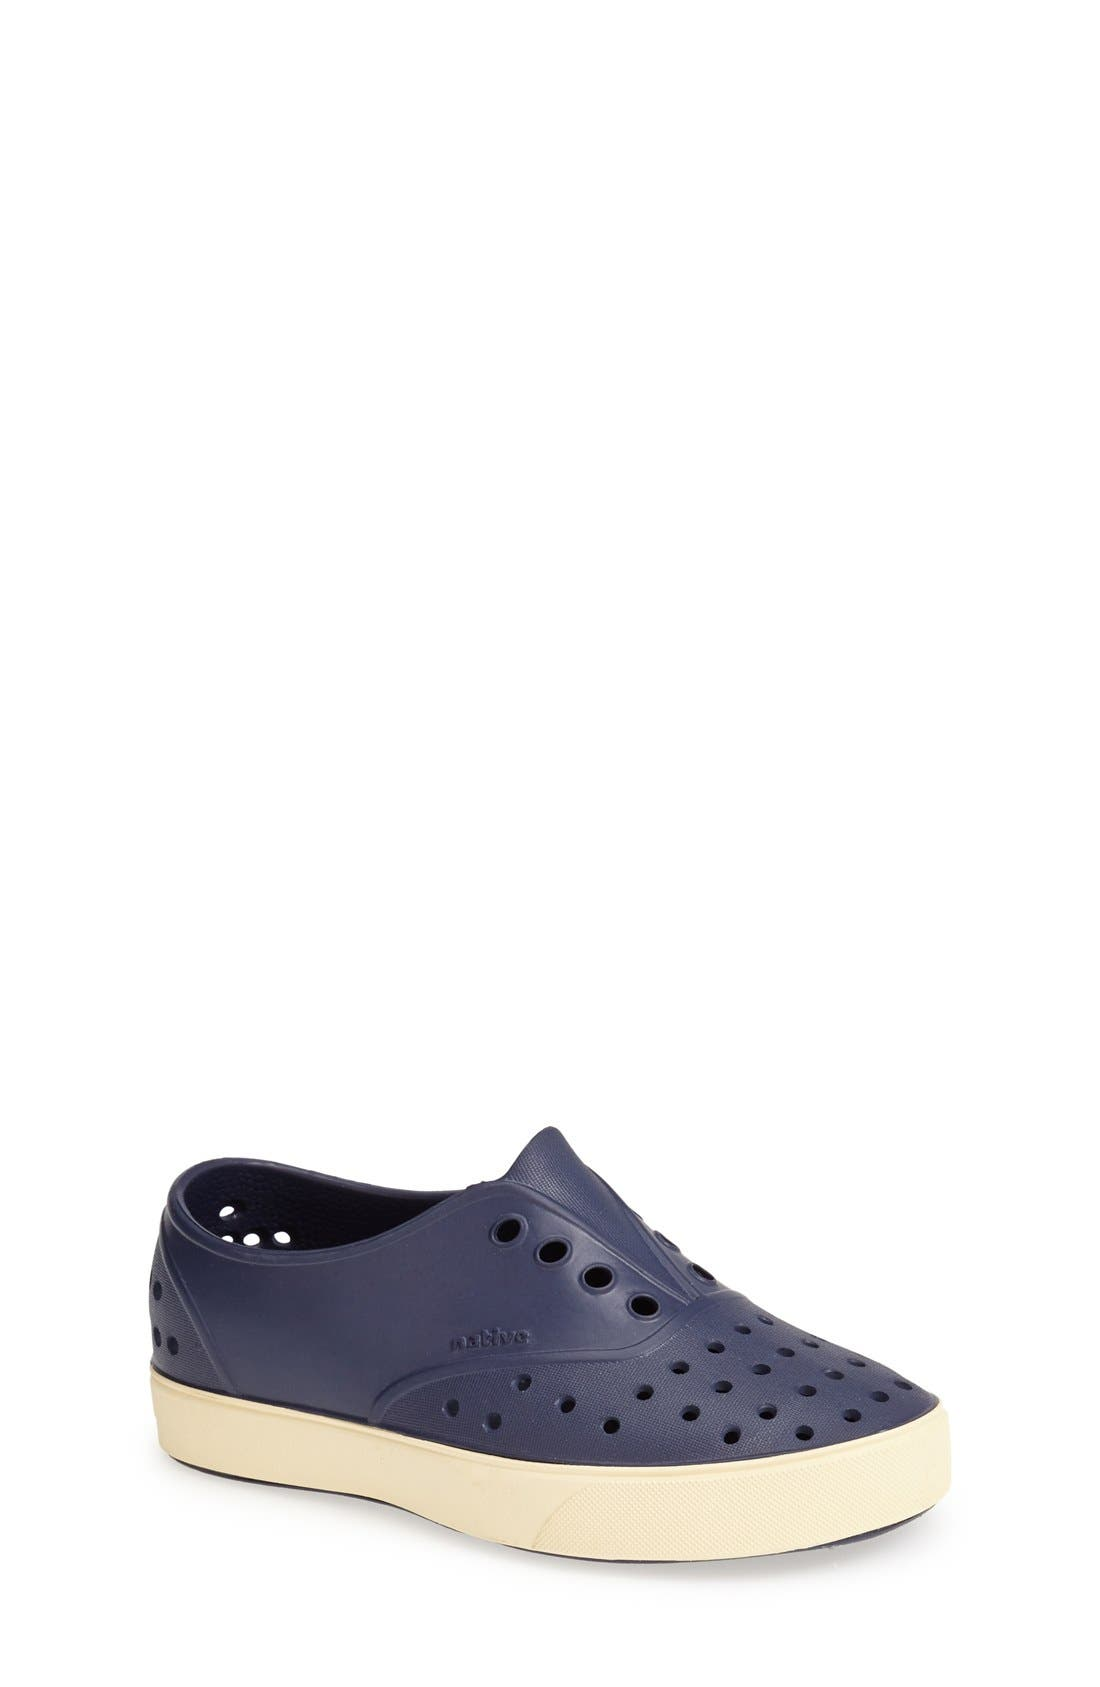 Alternate Image 1 Selected - Native Shoes 'Miller' Slip-On (Baby, Walker, Toddler & Little Kid)